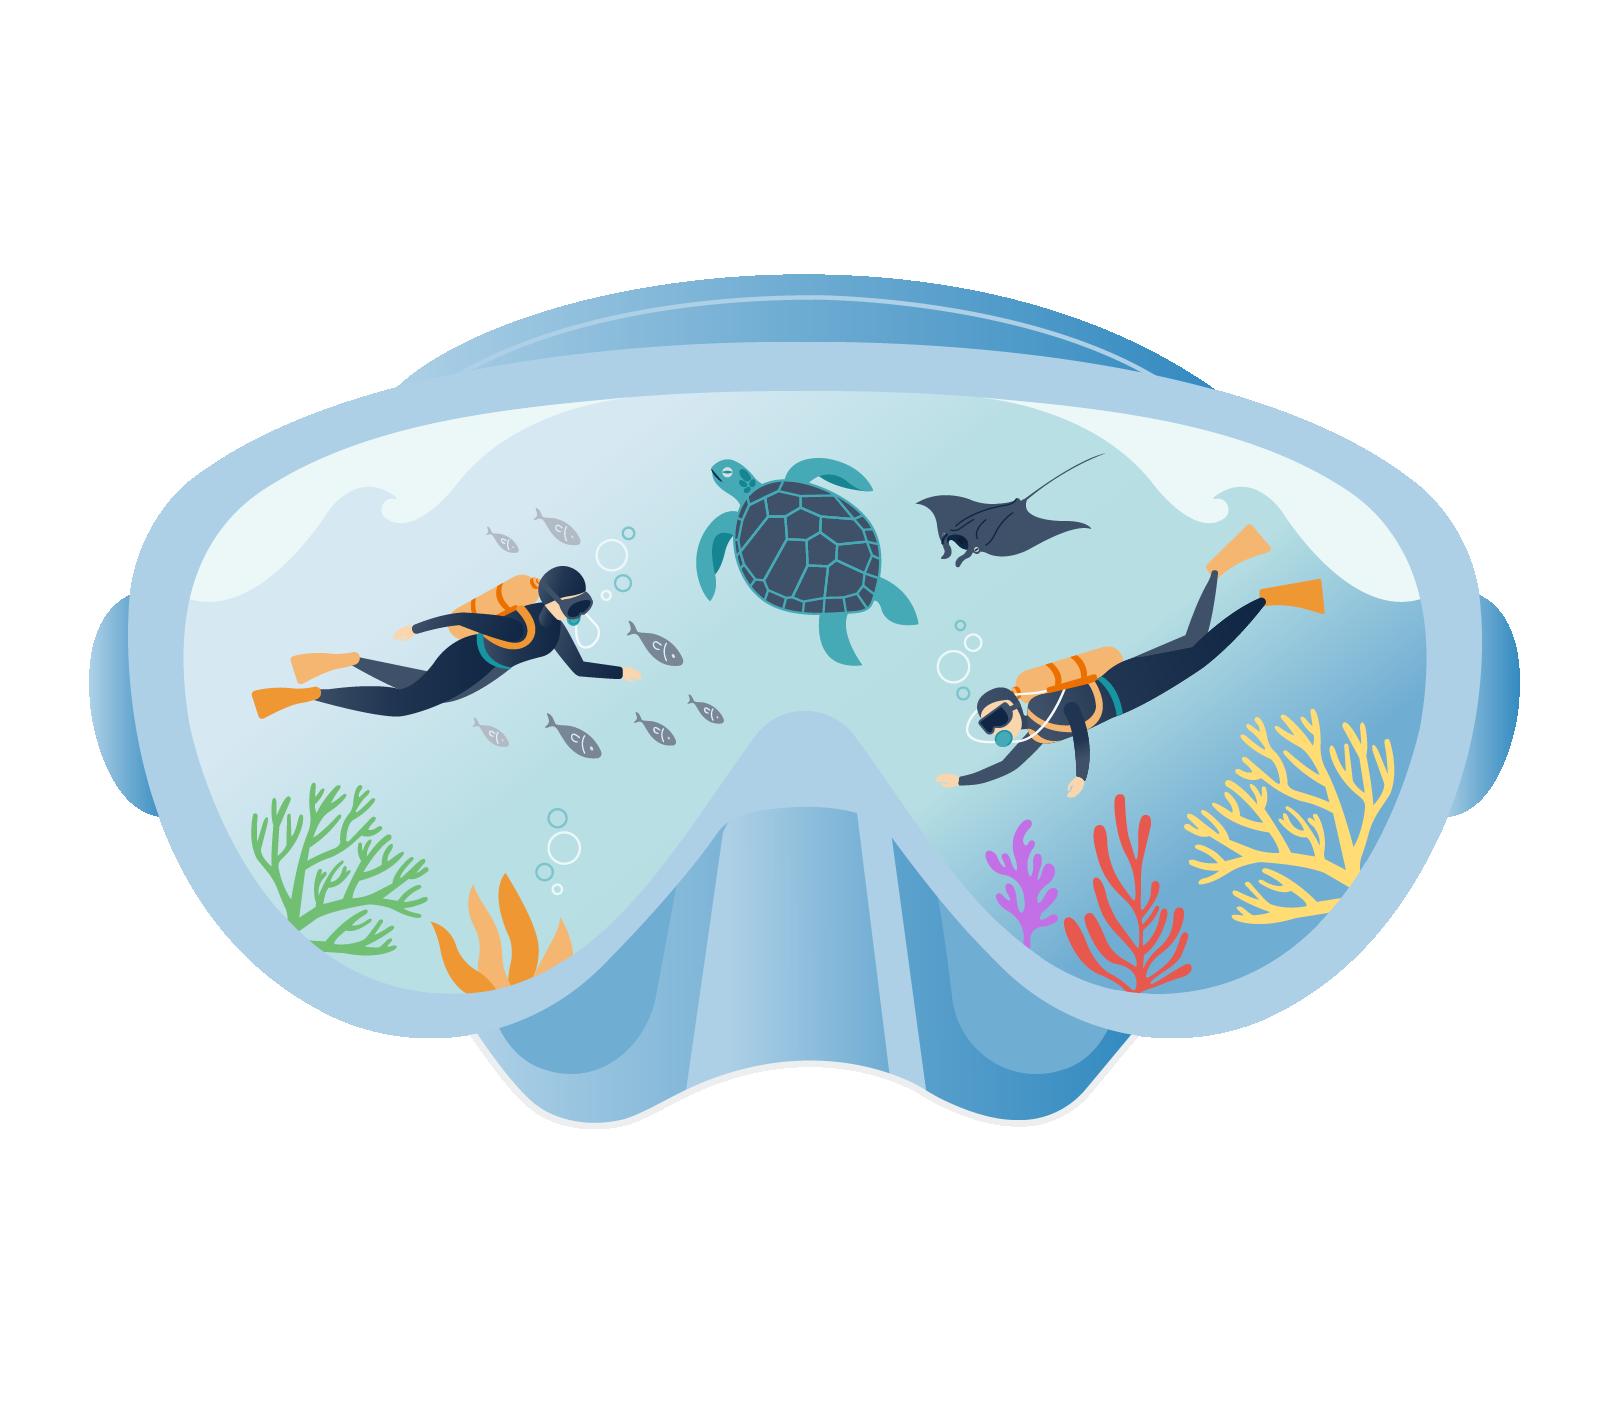 zublu_scuba_diving_illustration